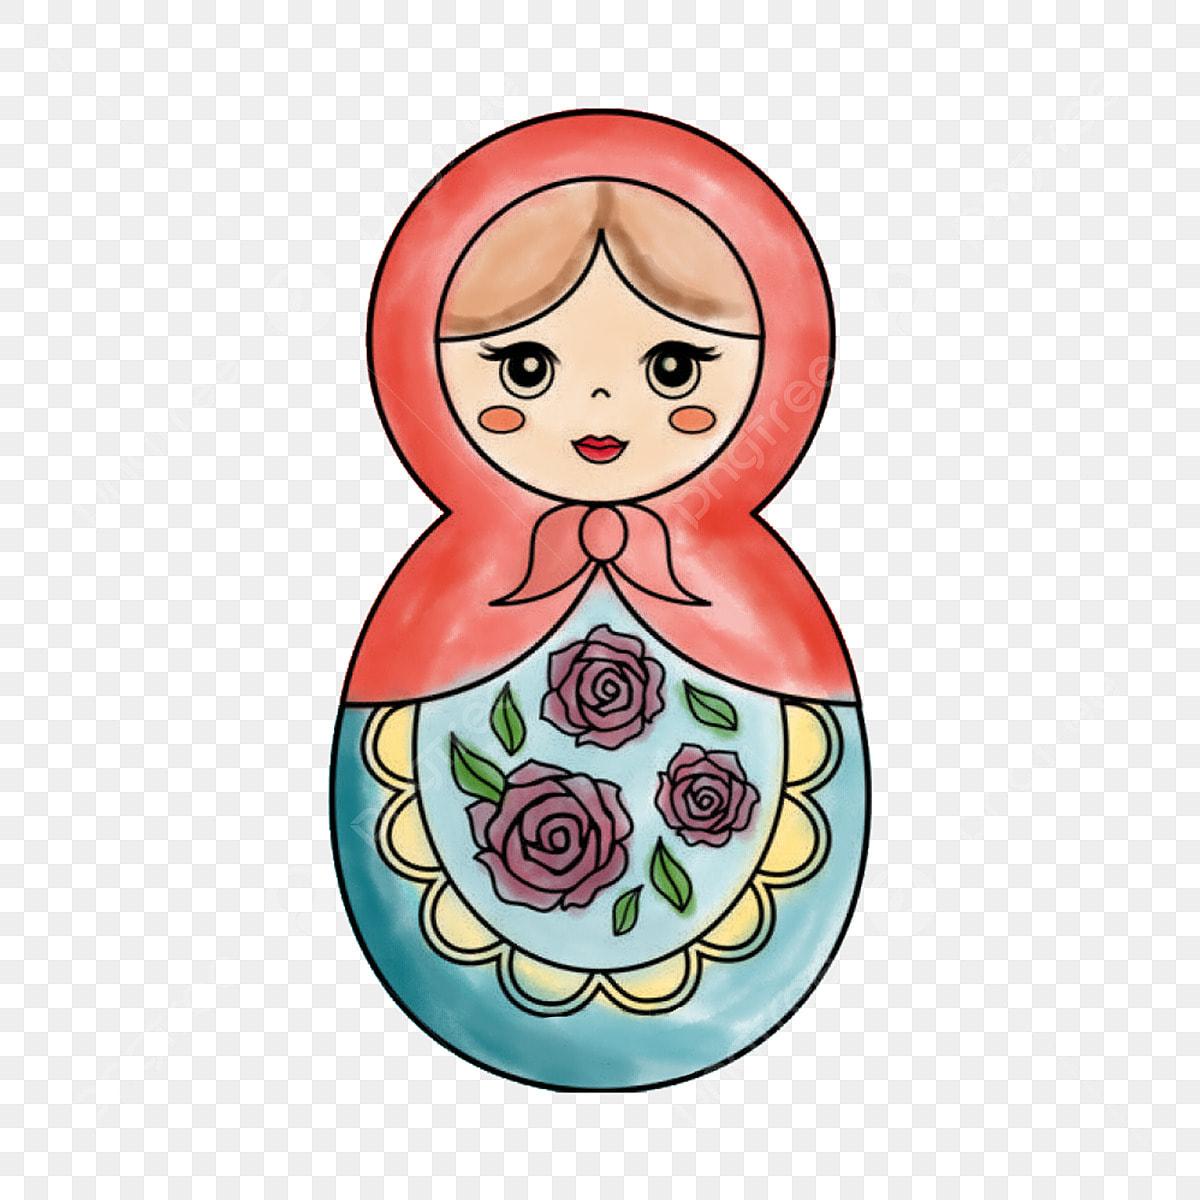 Matryoshka Dolls Set Stock Illustration - Download Image Now - iStock